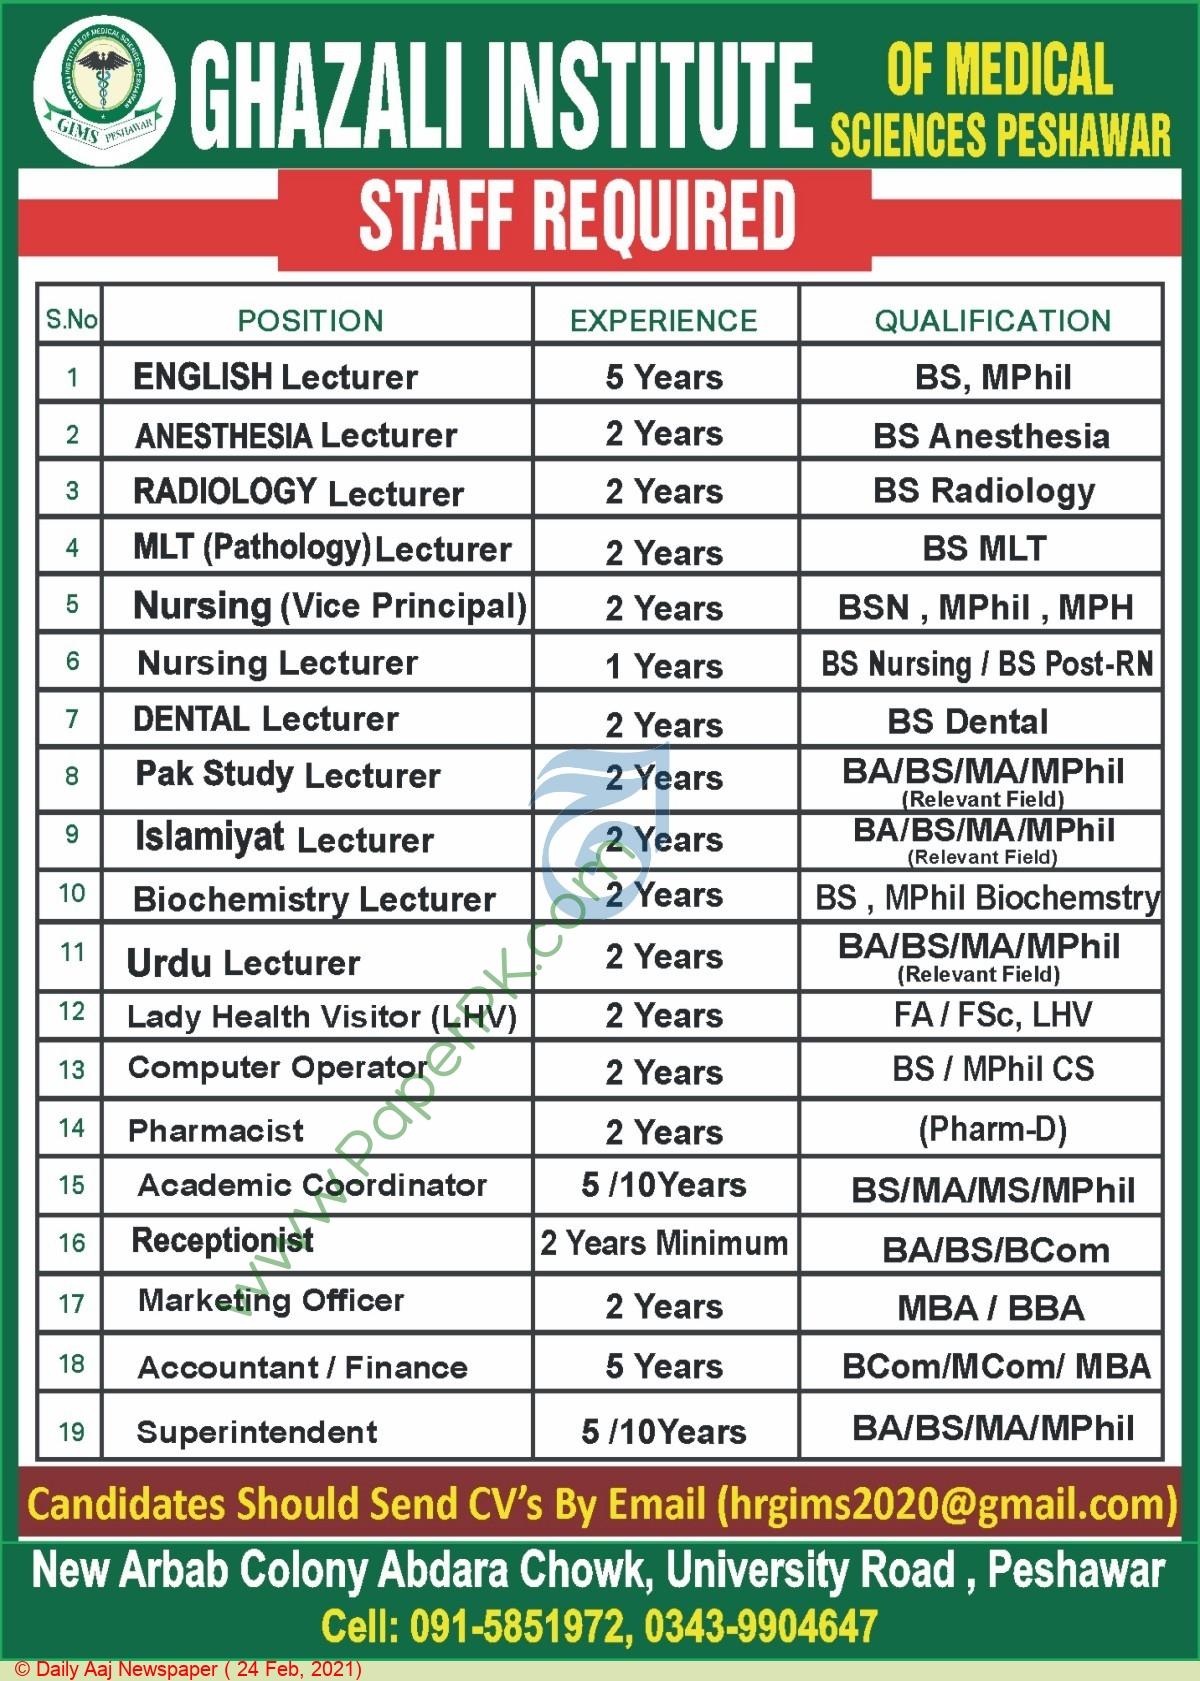 Ghazali Institute Of Medical Sciences jobs newspaper ad for Marketing Officer in Peshawar on 2021-02-24